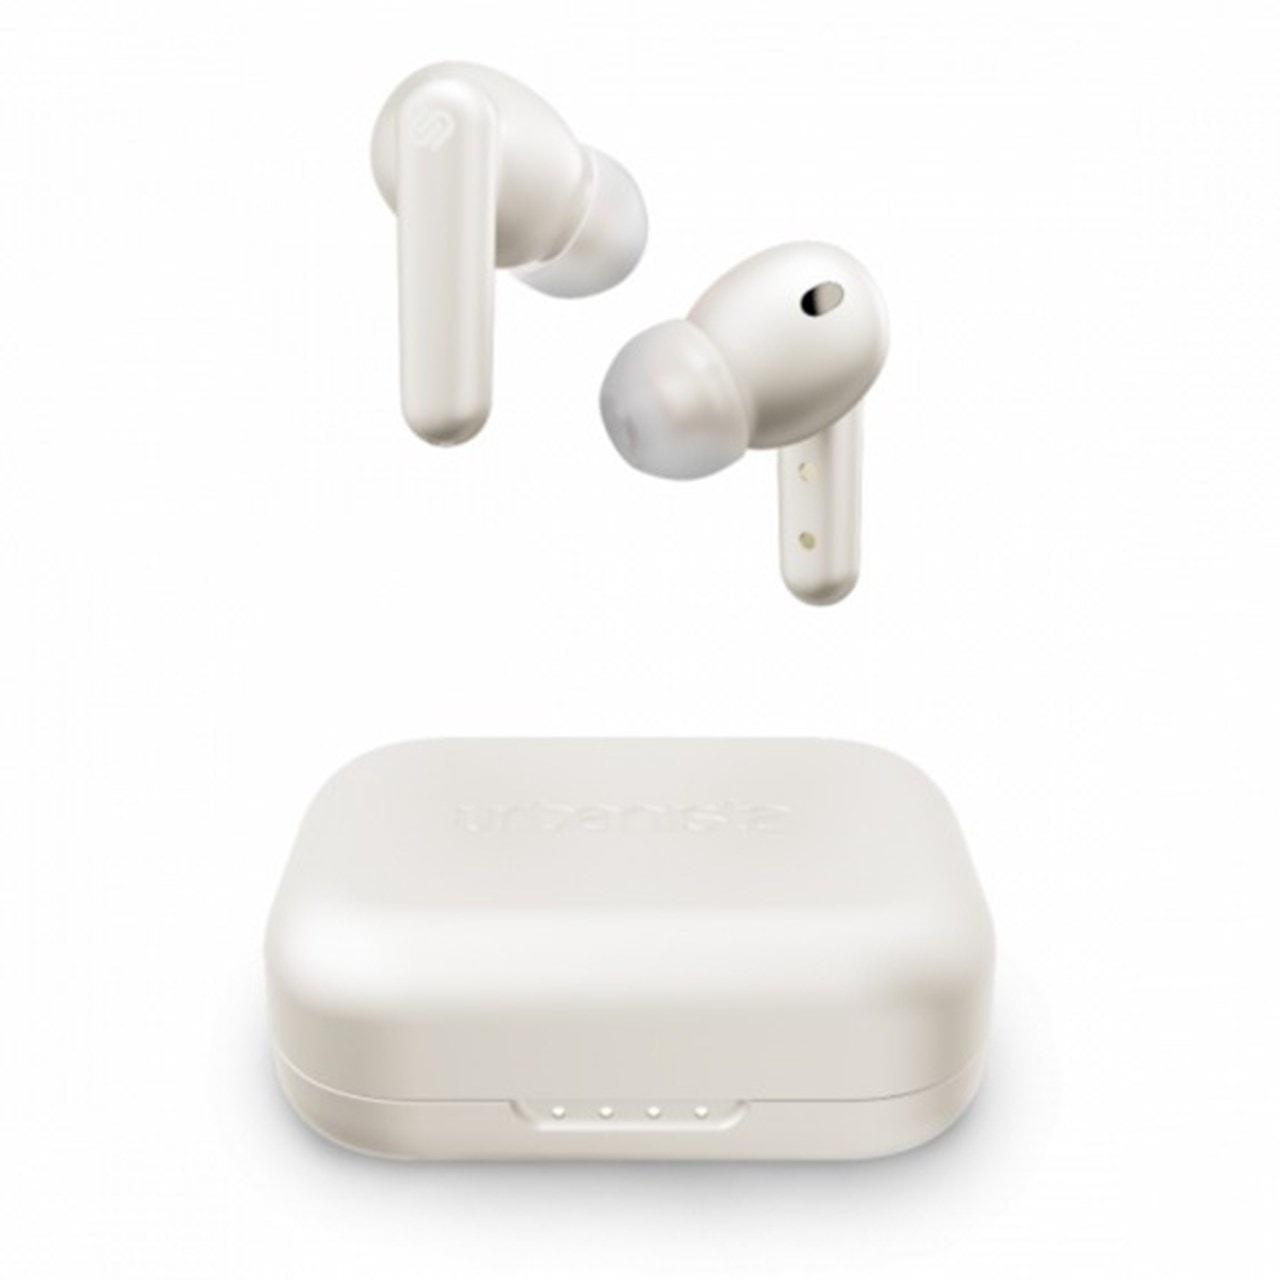 Urbanista London White Pearl True Wireless Active Noise Cancelling Bluetooth Earphones - 1